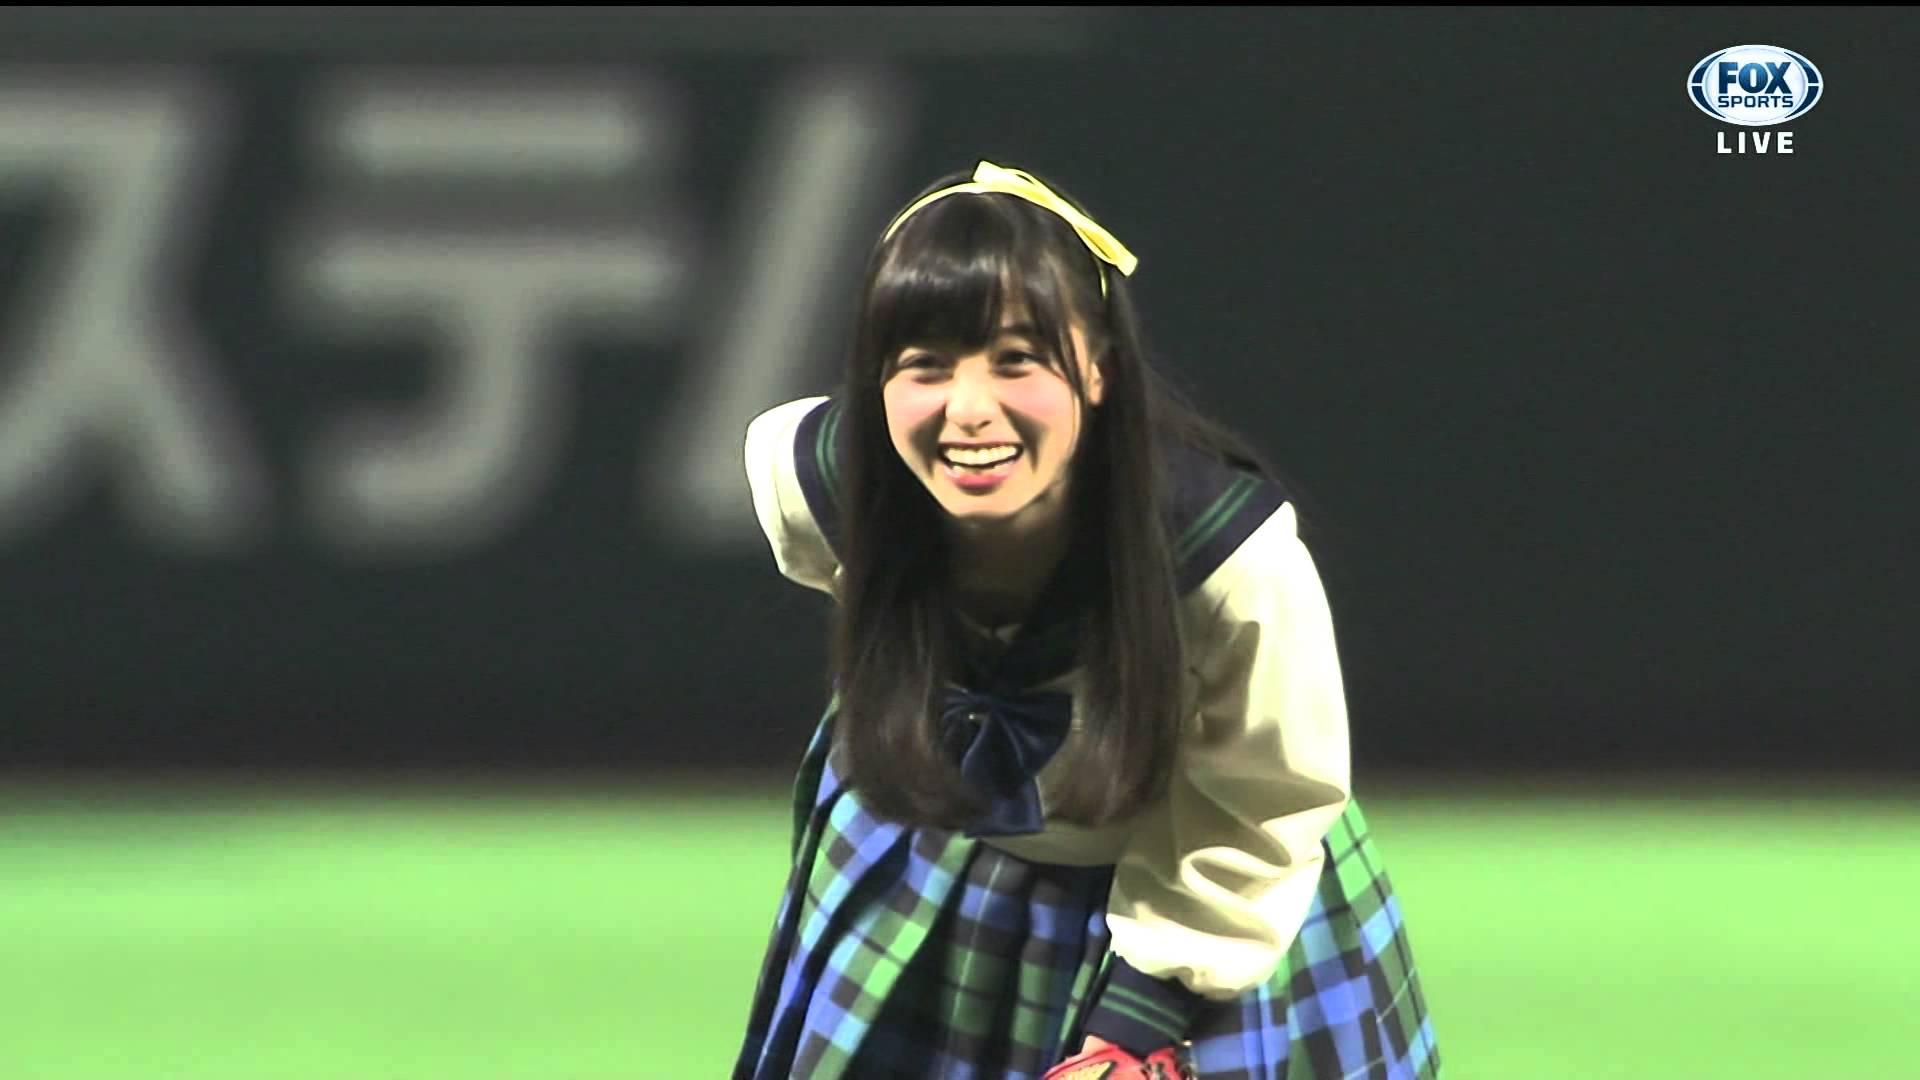 橋本環奈 制服姿で始球式!